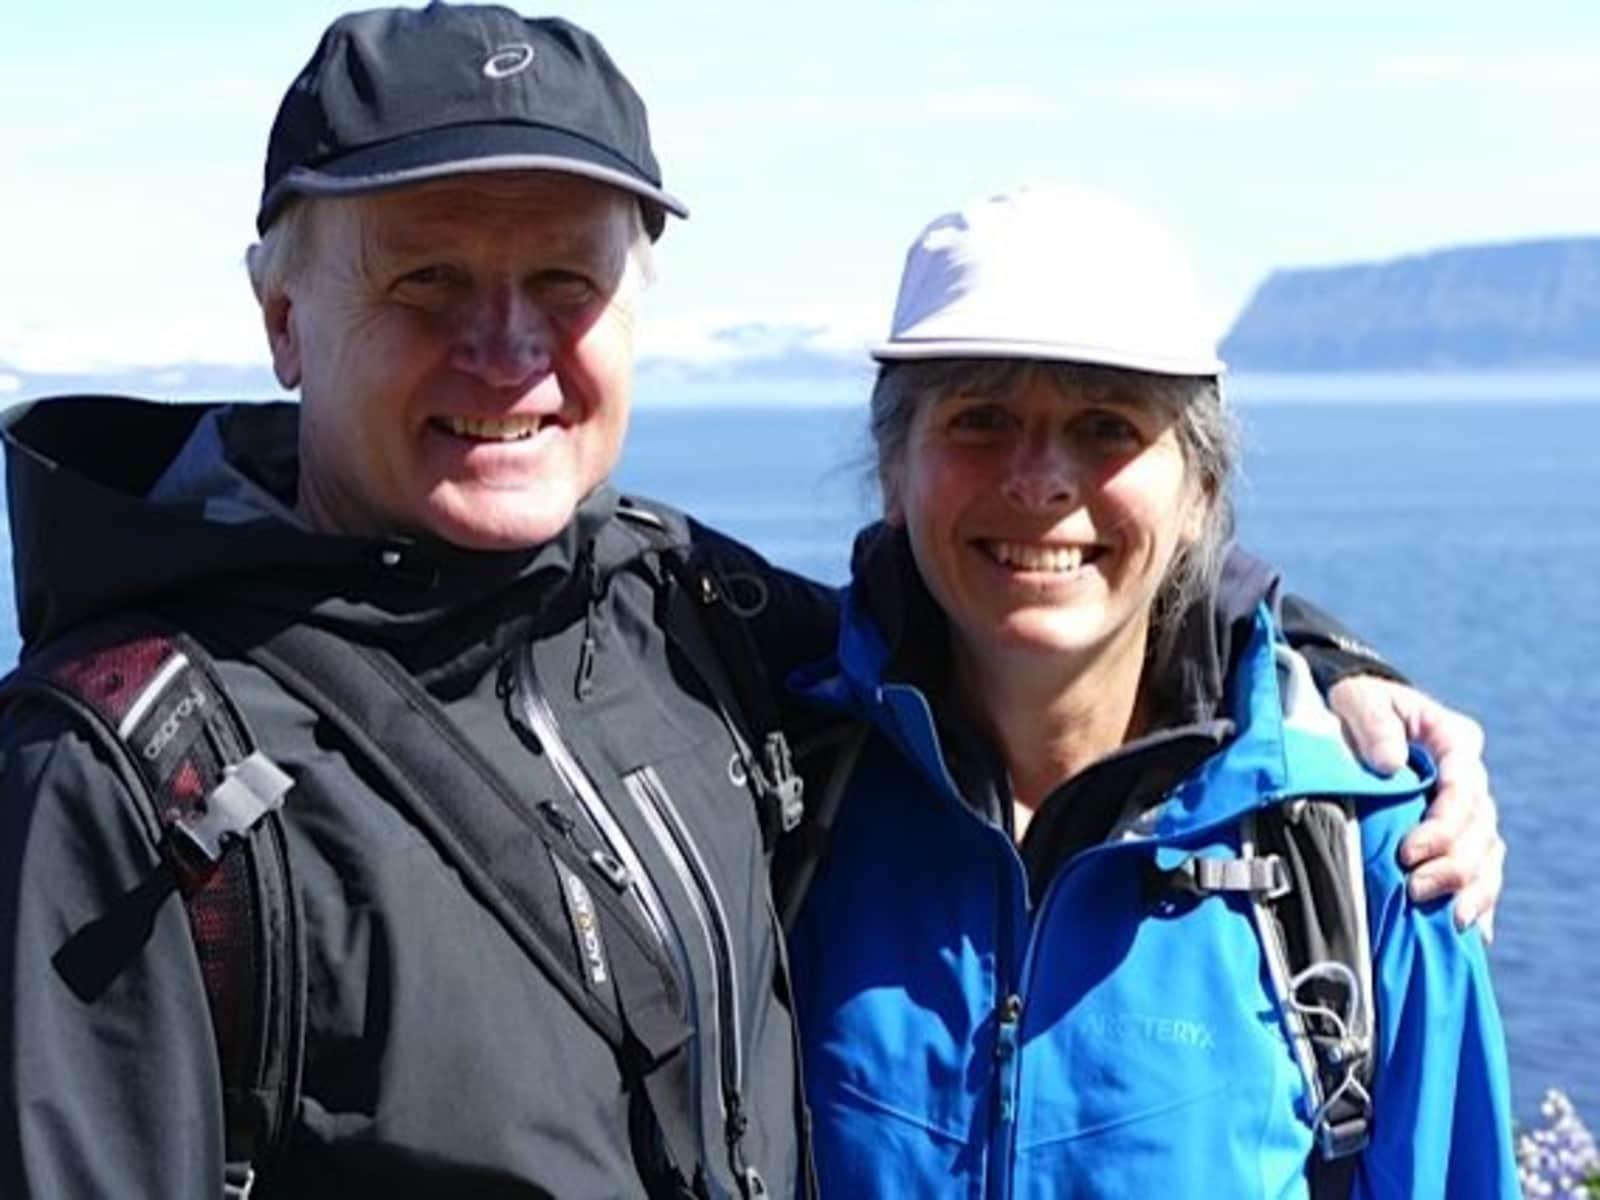 Patti & Rick from Stanley Bridge, Prince Edward Island, Canada